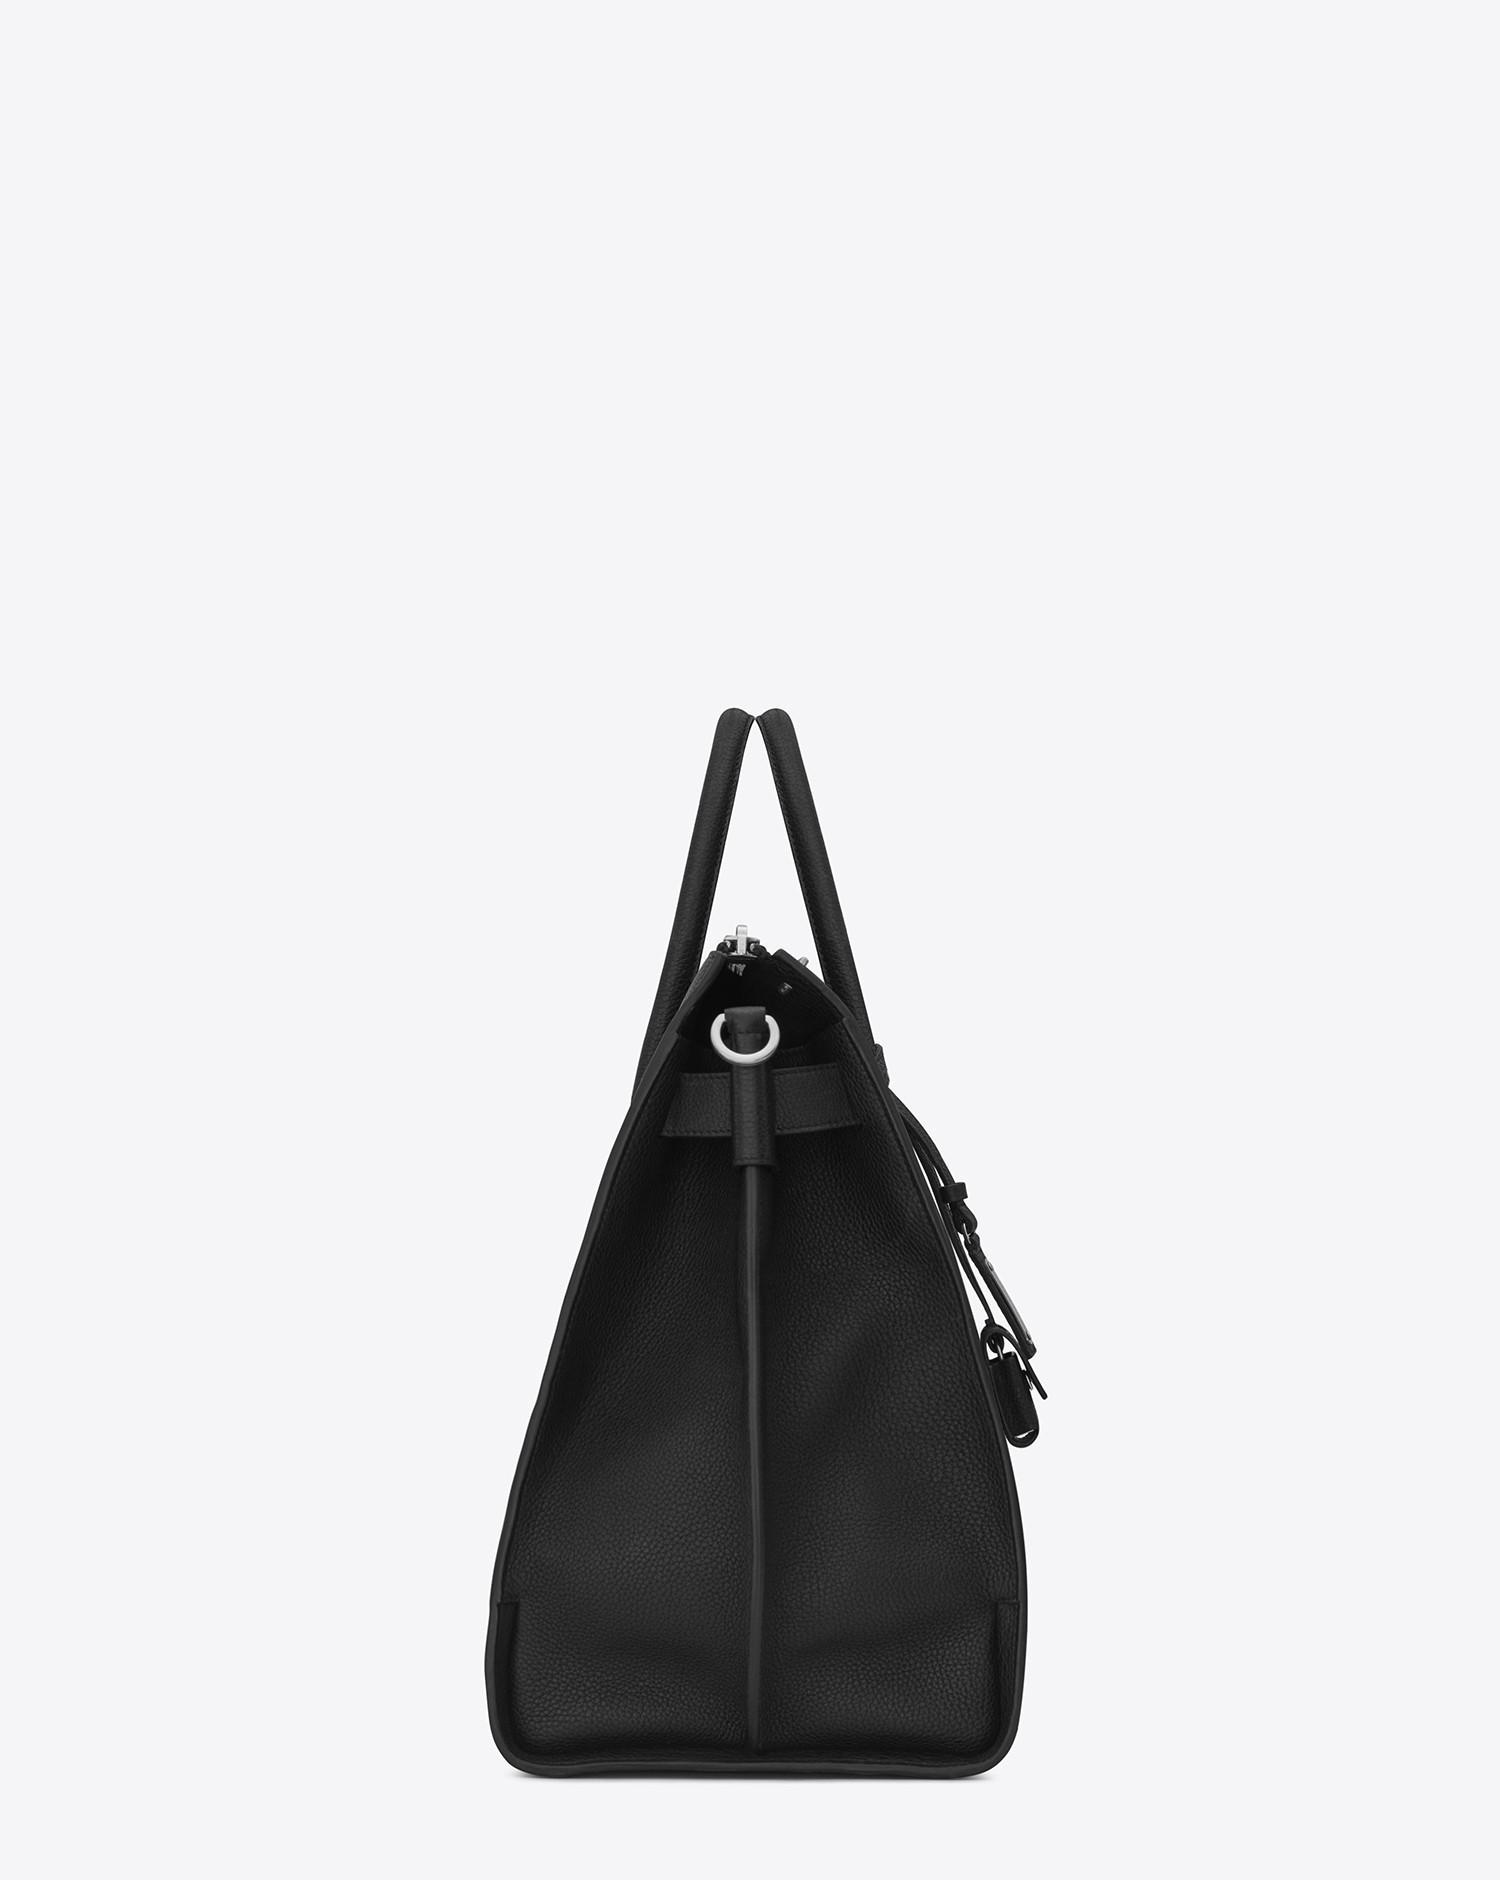 1da682e610cd Lyst - Saint Laurent Sac De Jour 48h Duffle Bag In Grained Leather in Black  for Men